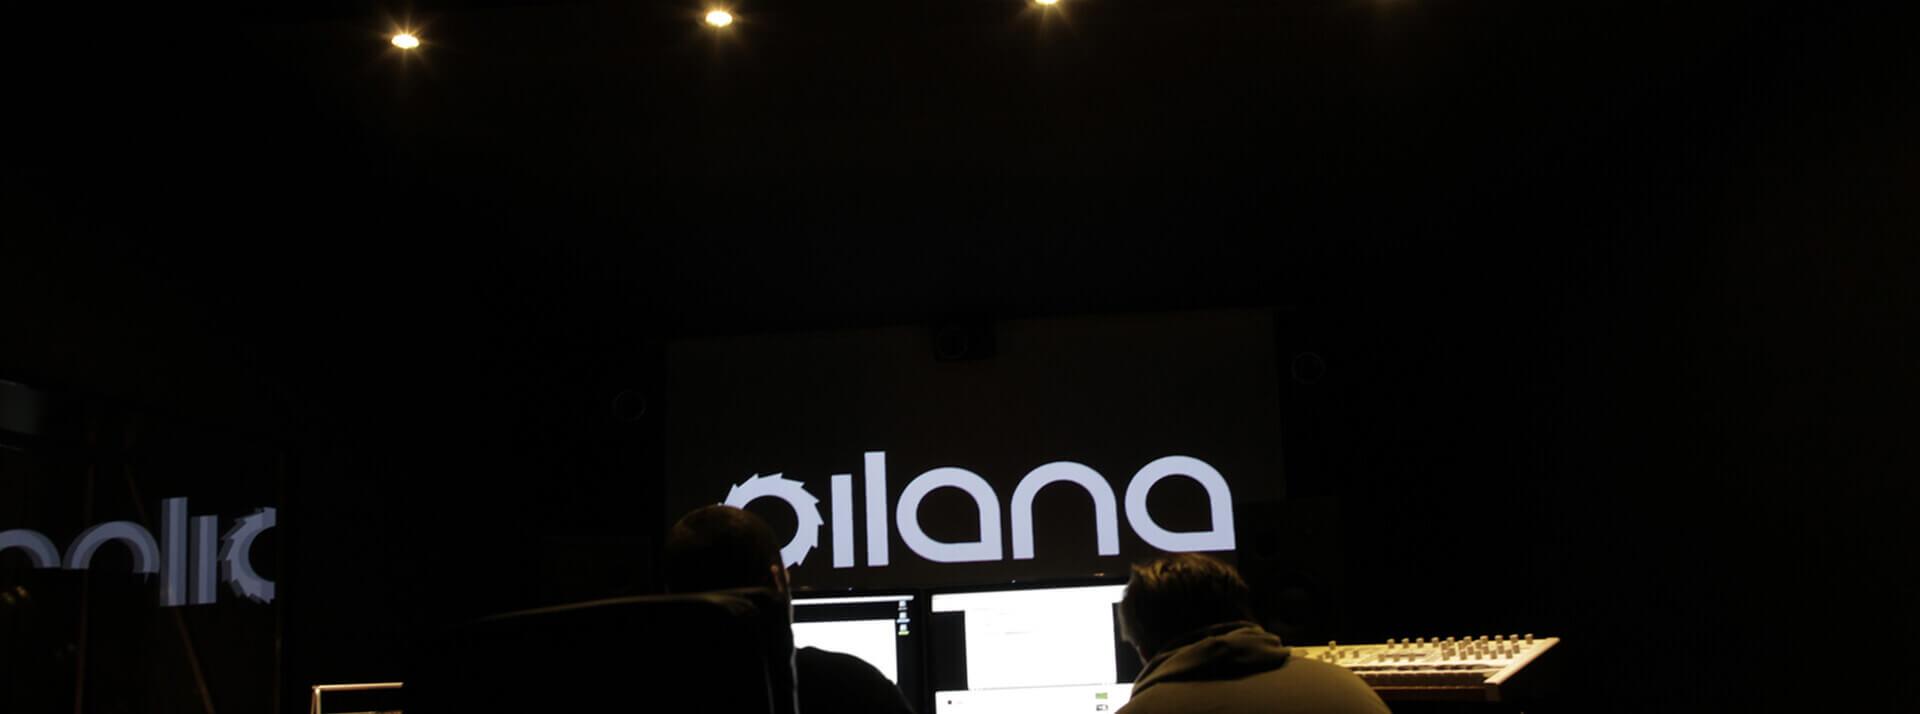 studio pilana